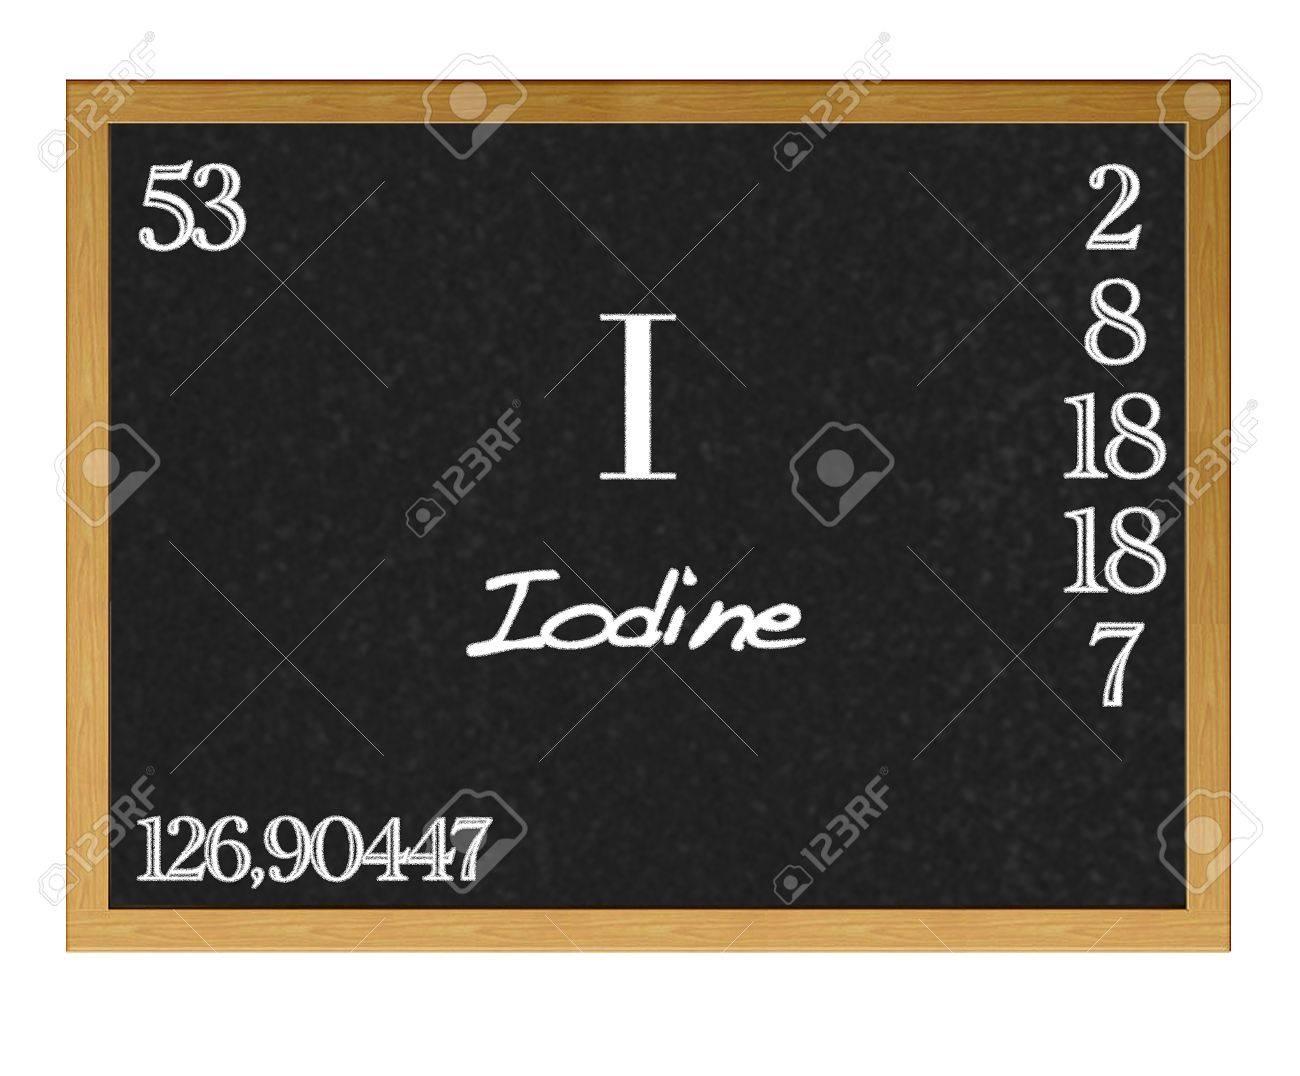 Isolated blackboard with periodic table iodine stock photo isolated blackboard with periodic table iodine stock photo 13151289 gamestrikefo Choice Image